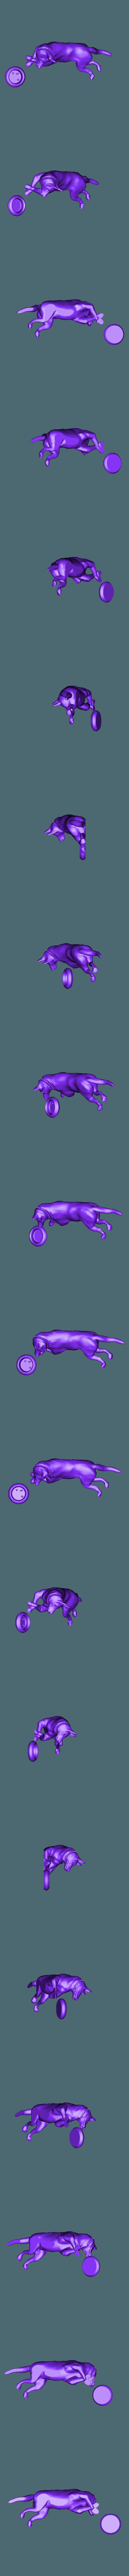 GermanShephard.stl Download free STL file German Shepherd • 3D printable template, Double_Alfa_3D